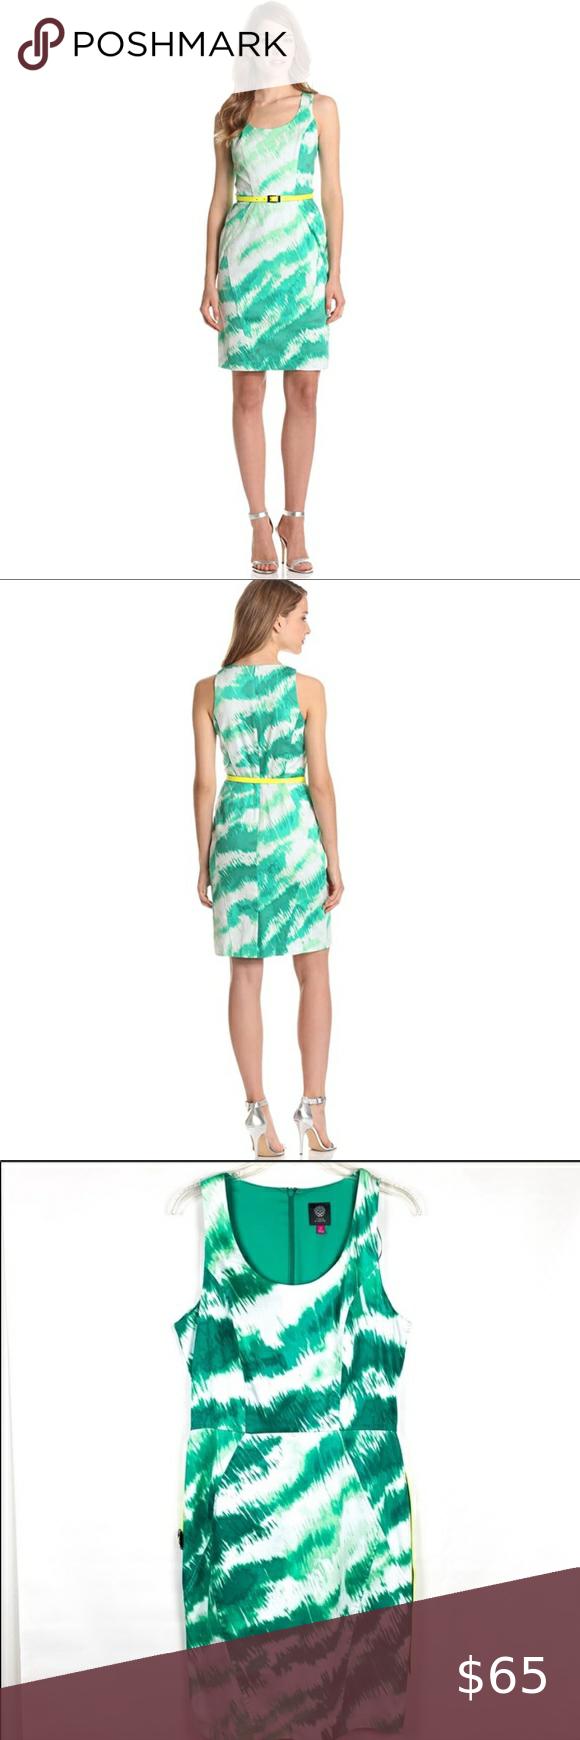 Vince Camuto Structured Sheath Dress Feline Green Sheath Dress Sleeveless Sheath Dress Dresses [ 1740 x 580 Pixel ]